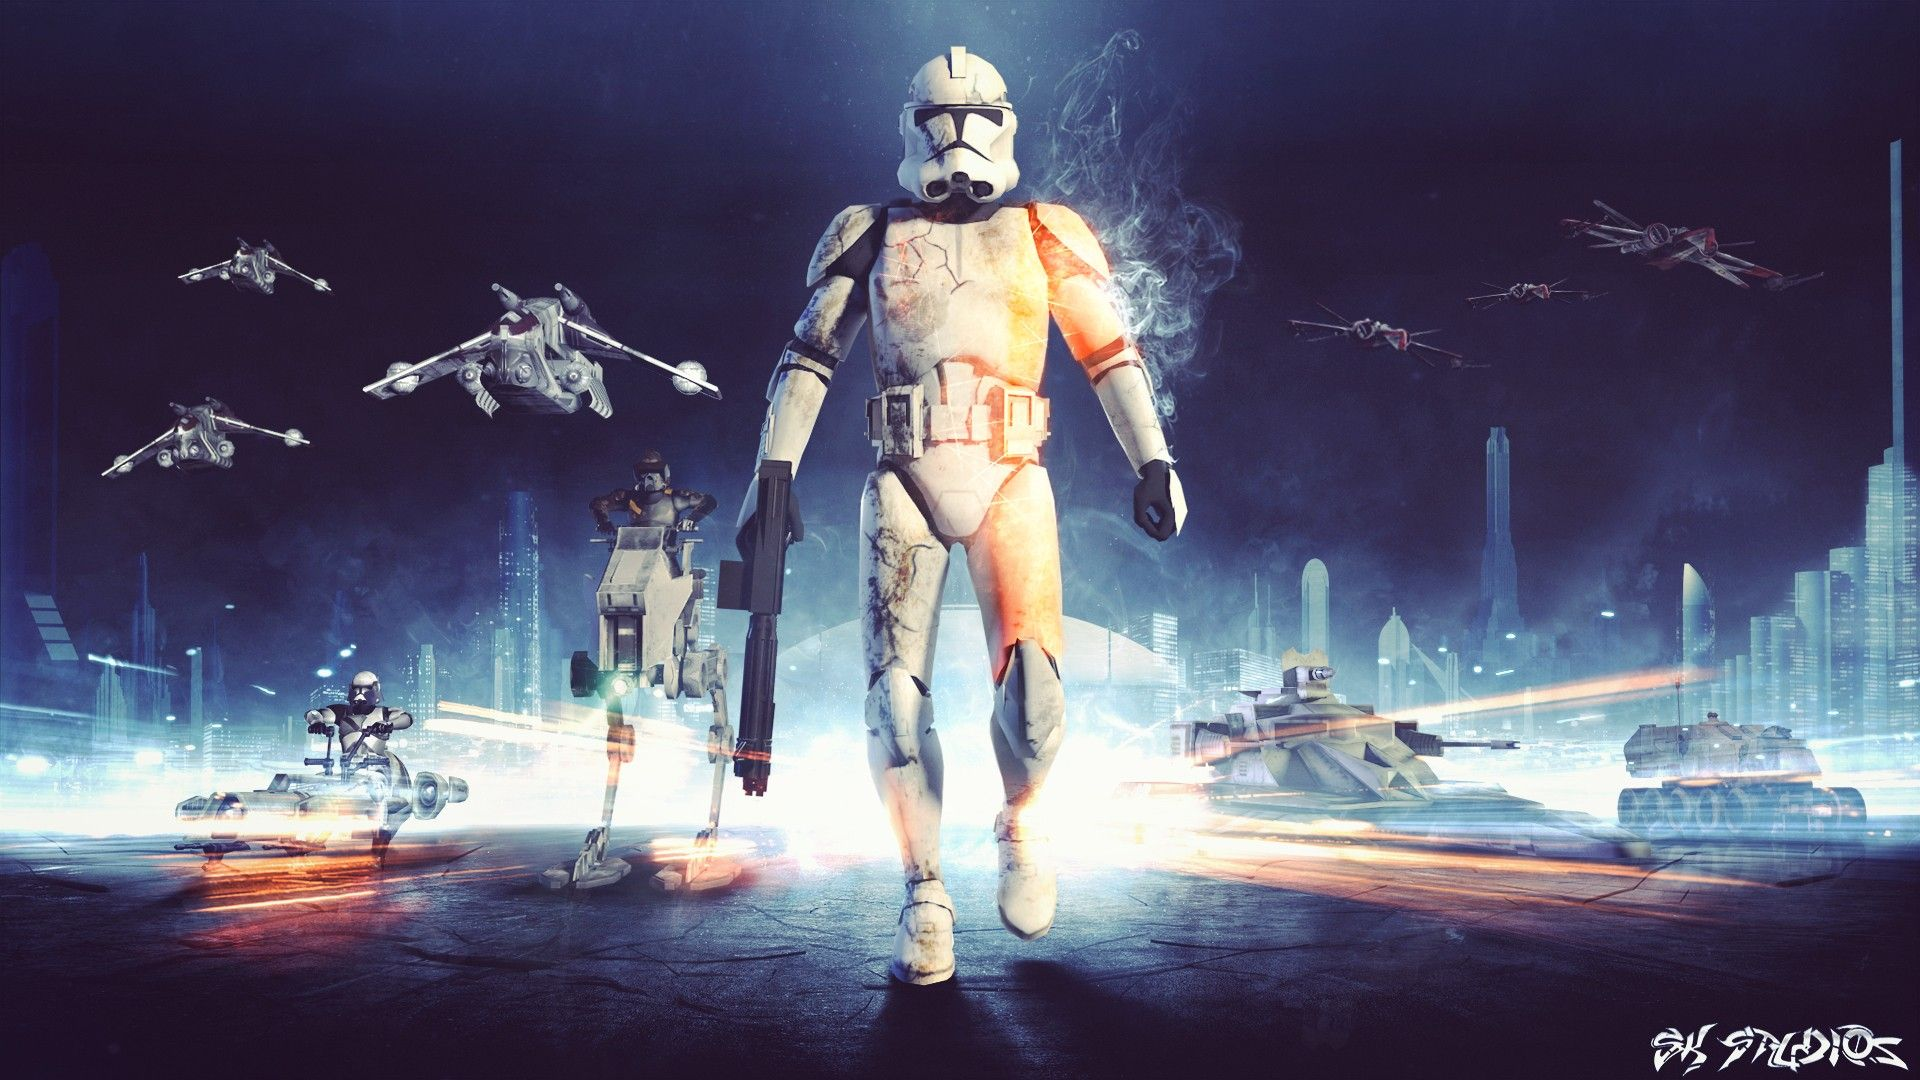 Guerra de las galaxias clon guerras videos porno